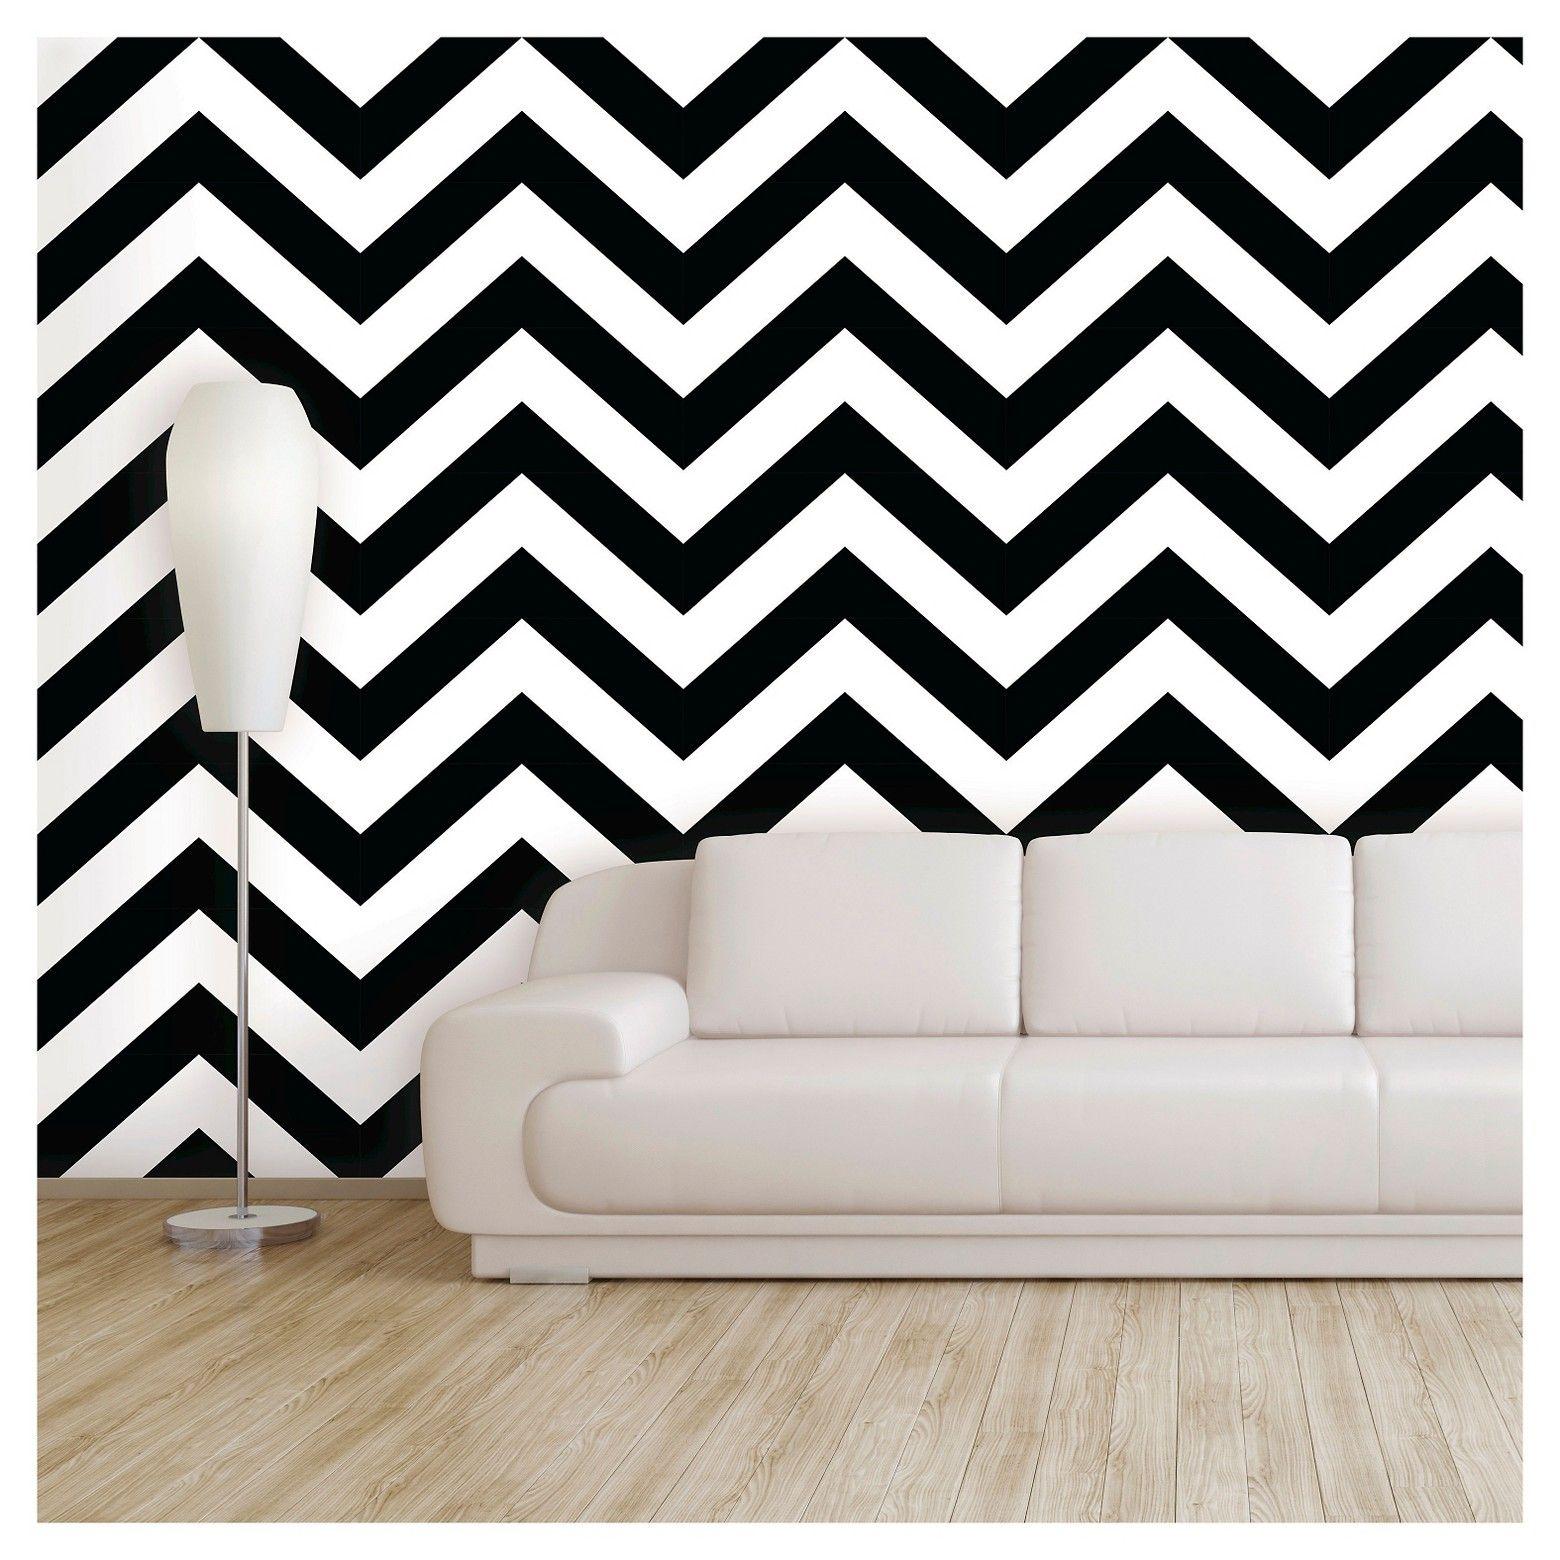 Devine Color Zig Zag Peel Stick Wallpaper Black White Peel And Stick Wallpaper Zig Zag Wall Wallpaper